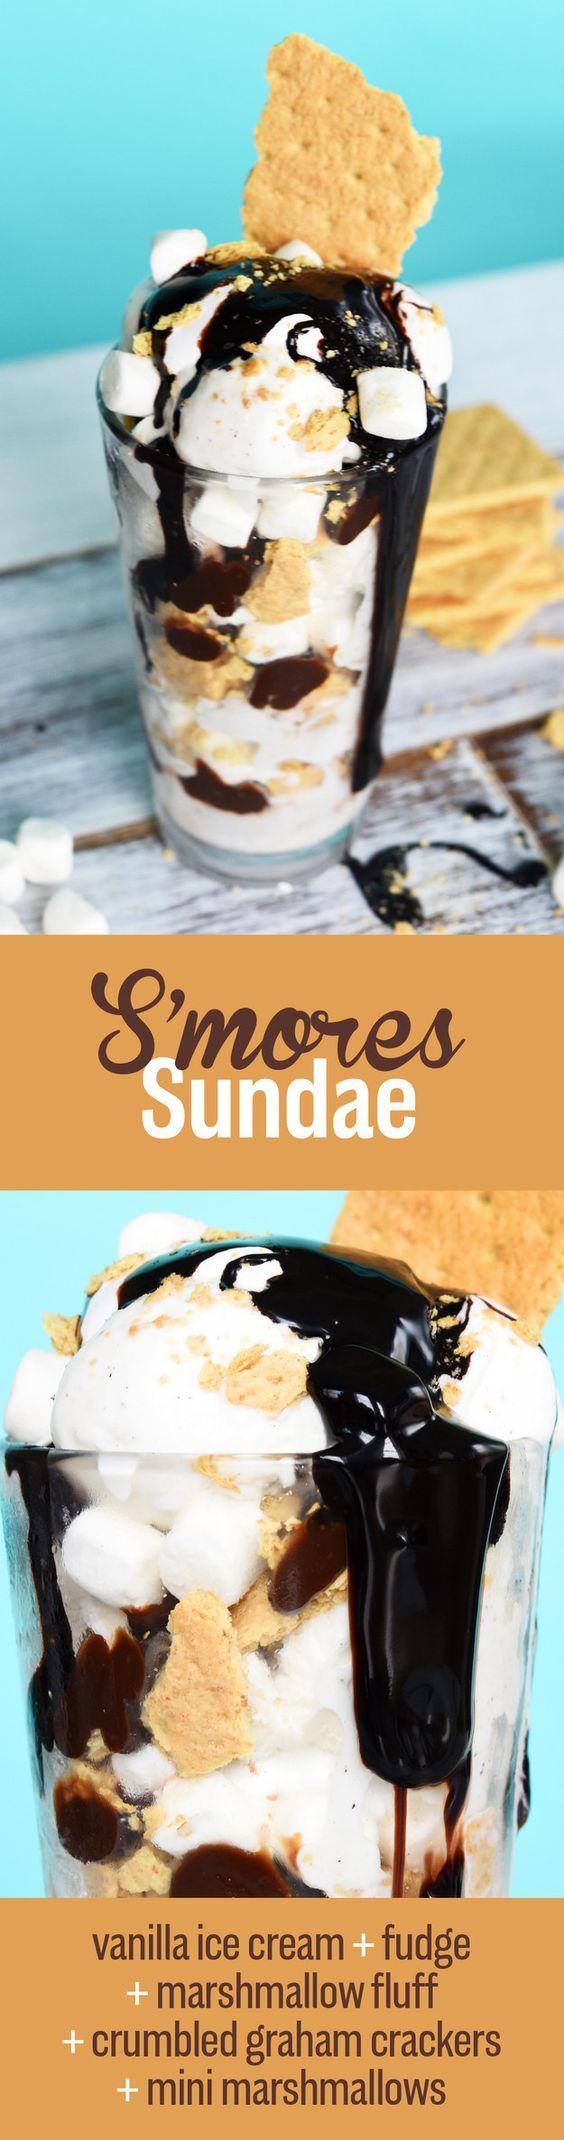 mores Sundae | 7 Insanely Delicious Sundaes You Need To Eat Before ...